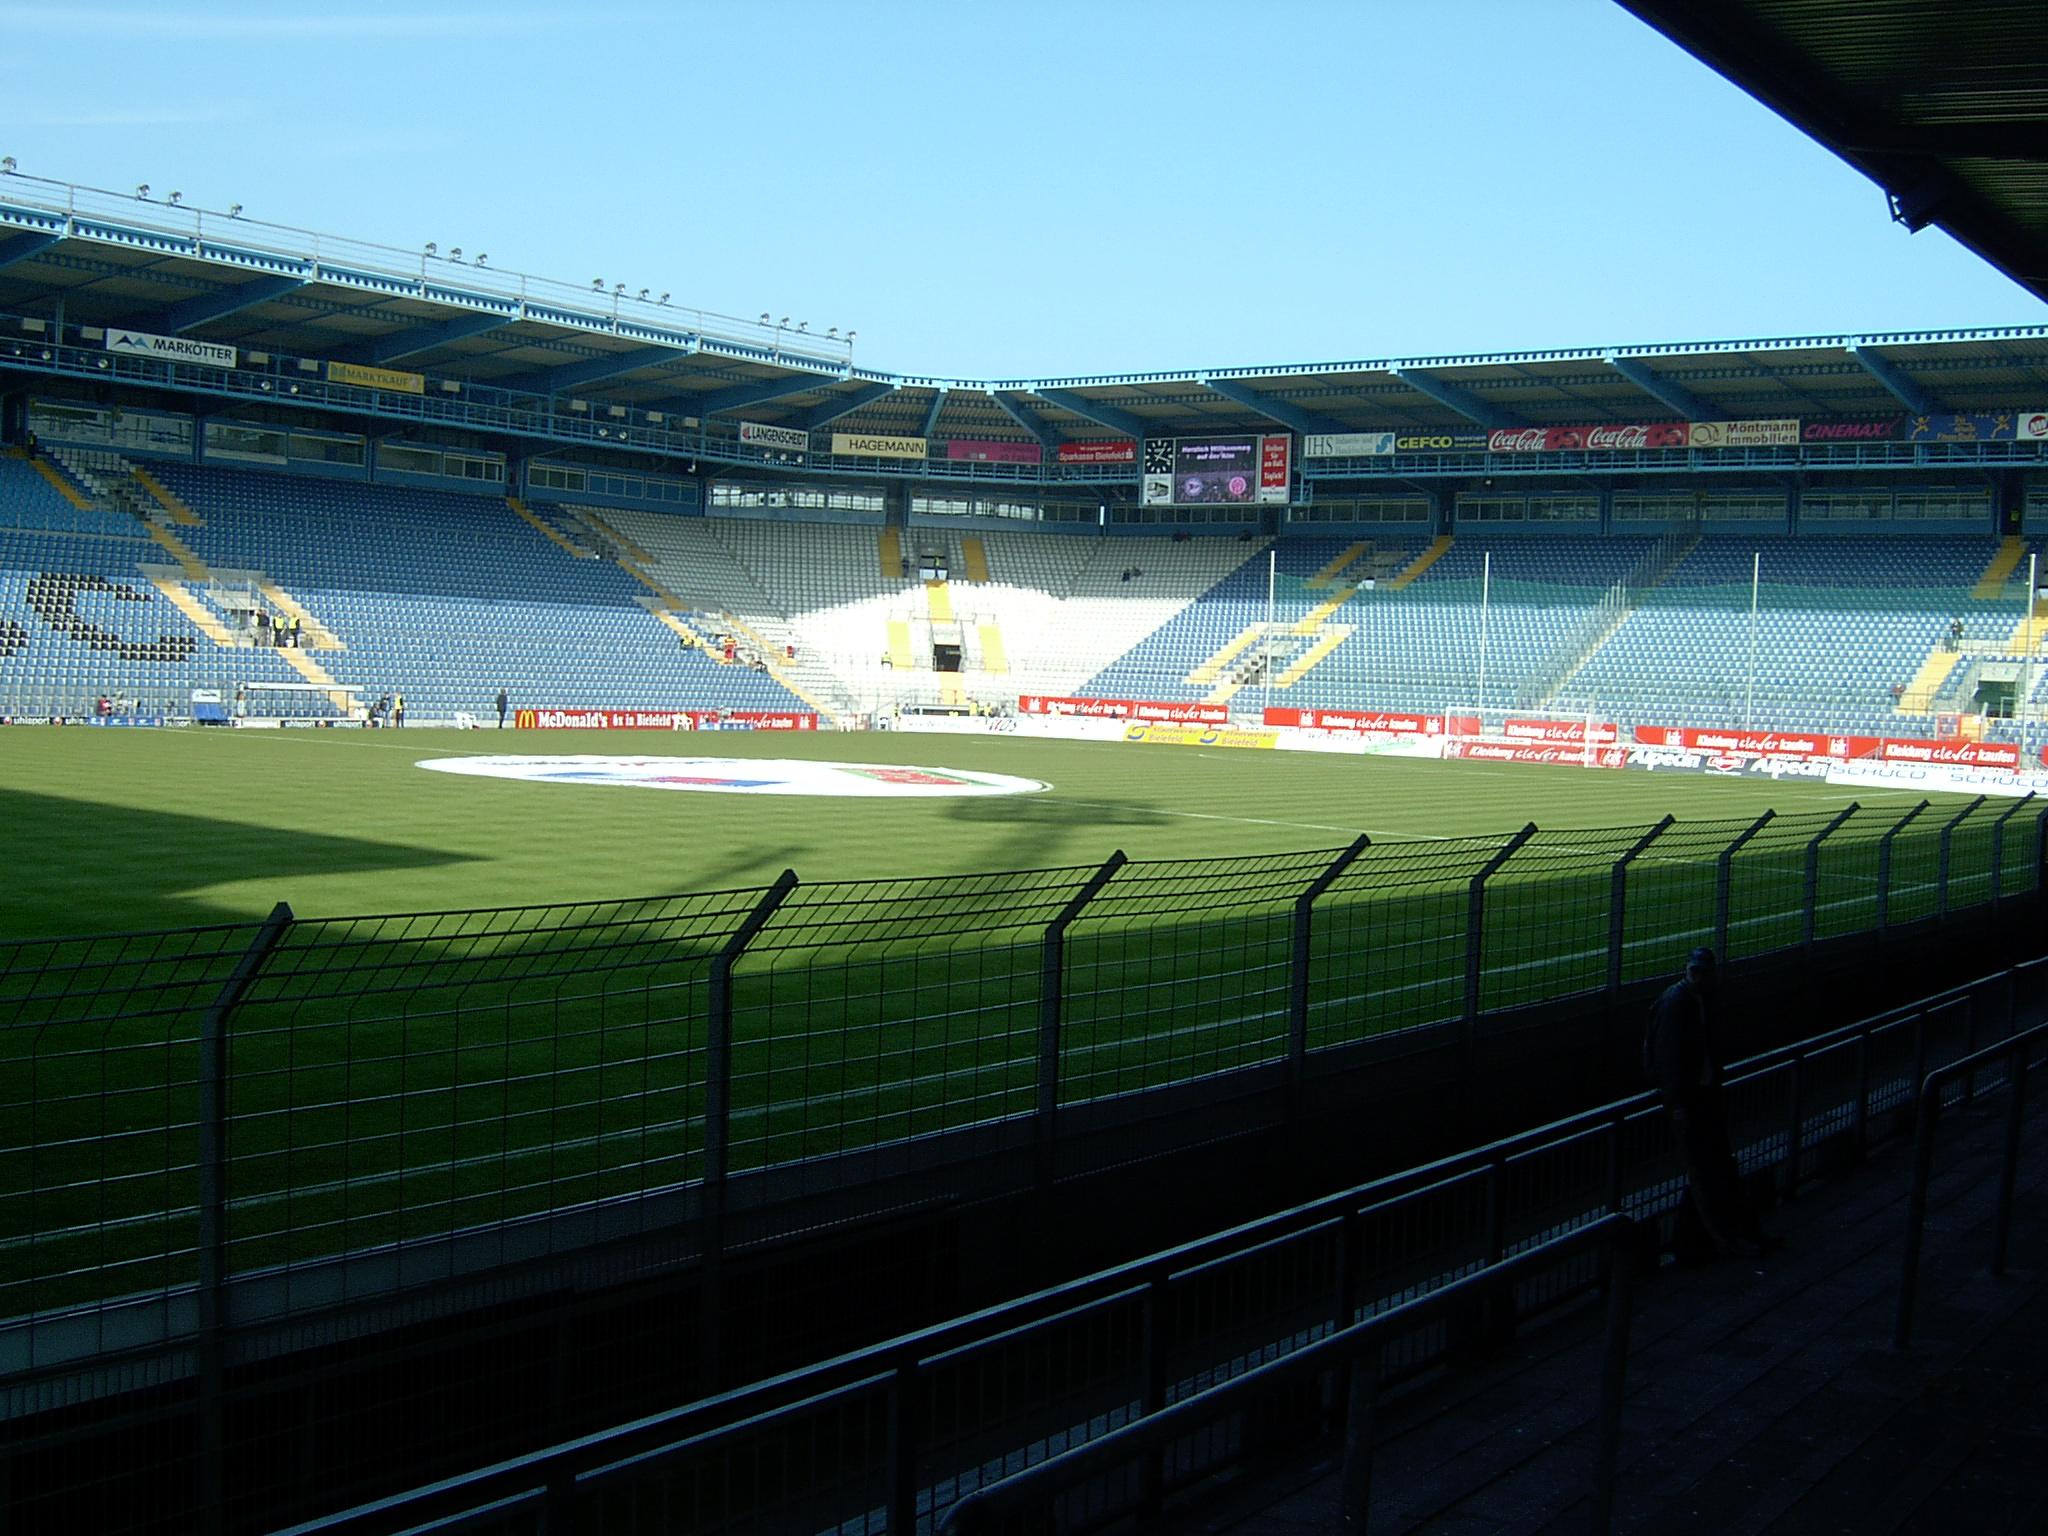 Blick in Nord-West-Ecke des Stadions